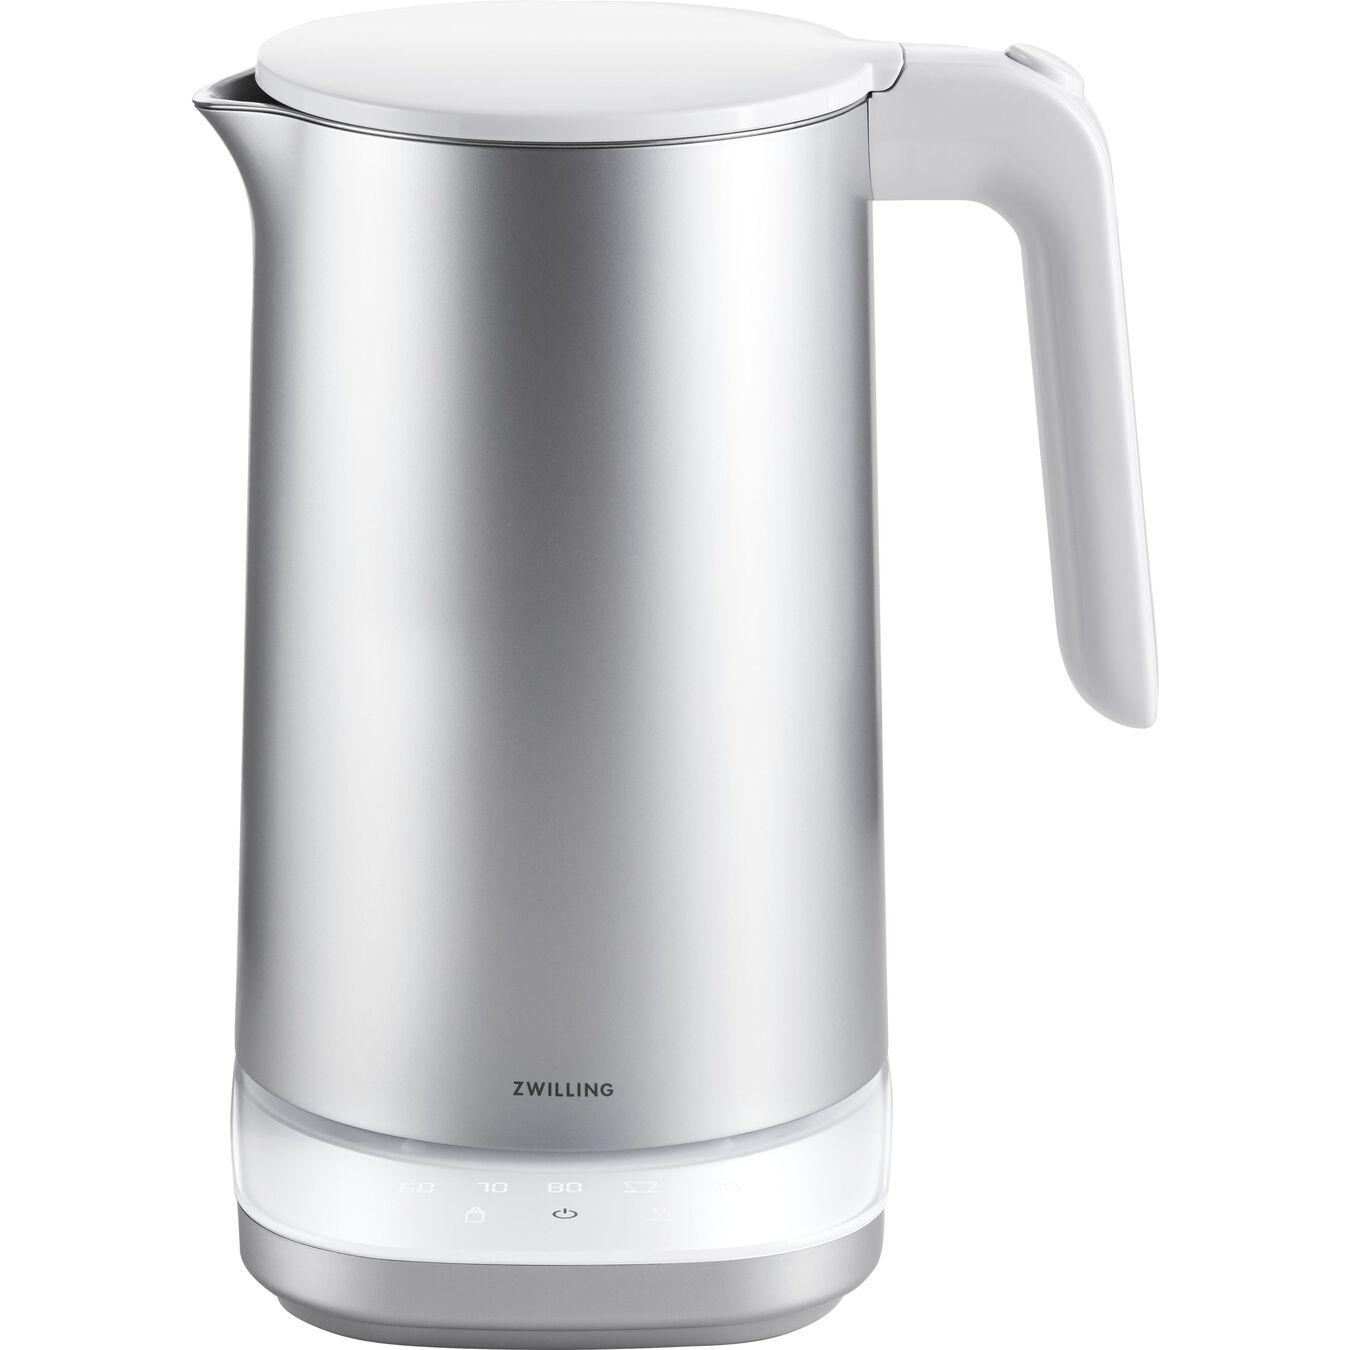 Wasserkocher Pro, 1,5 l, Silber,,large 8